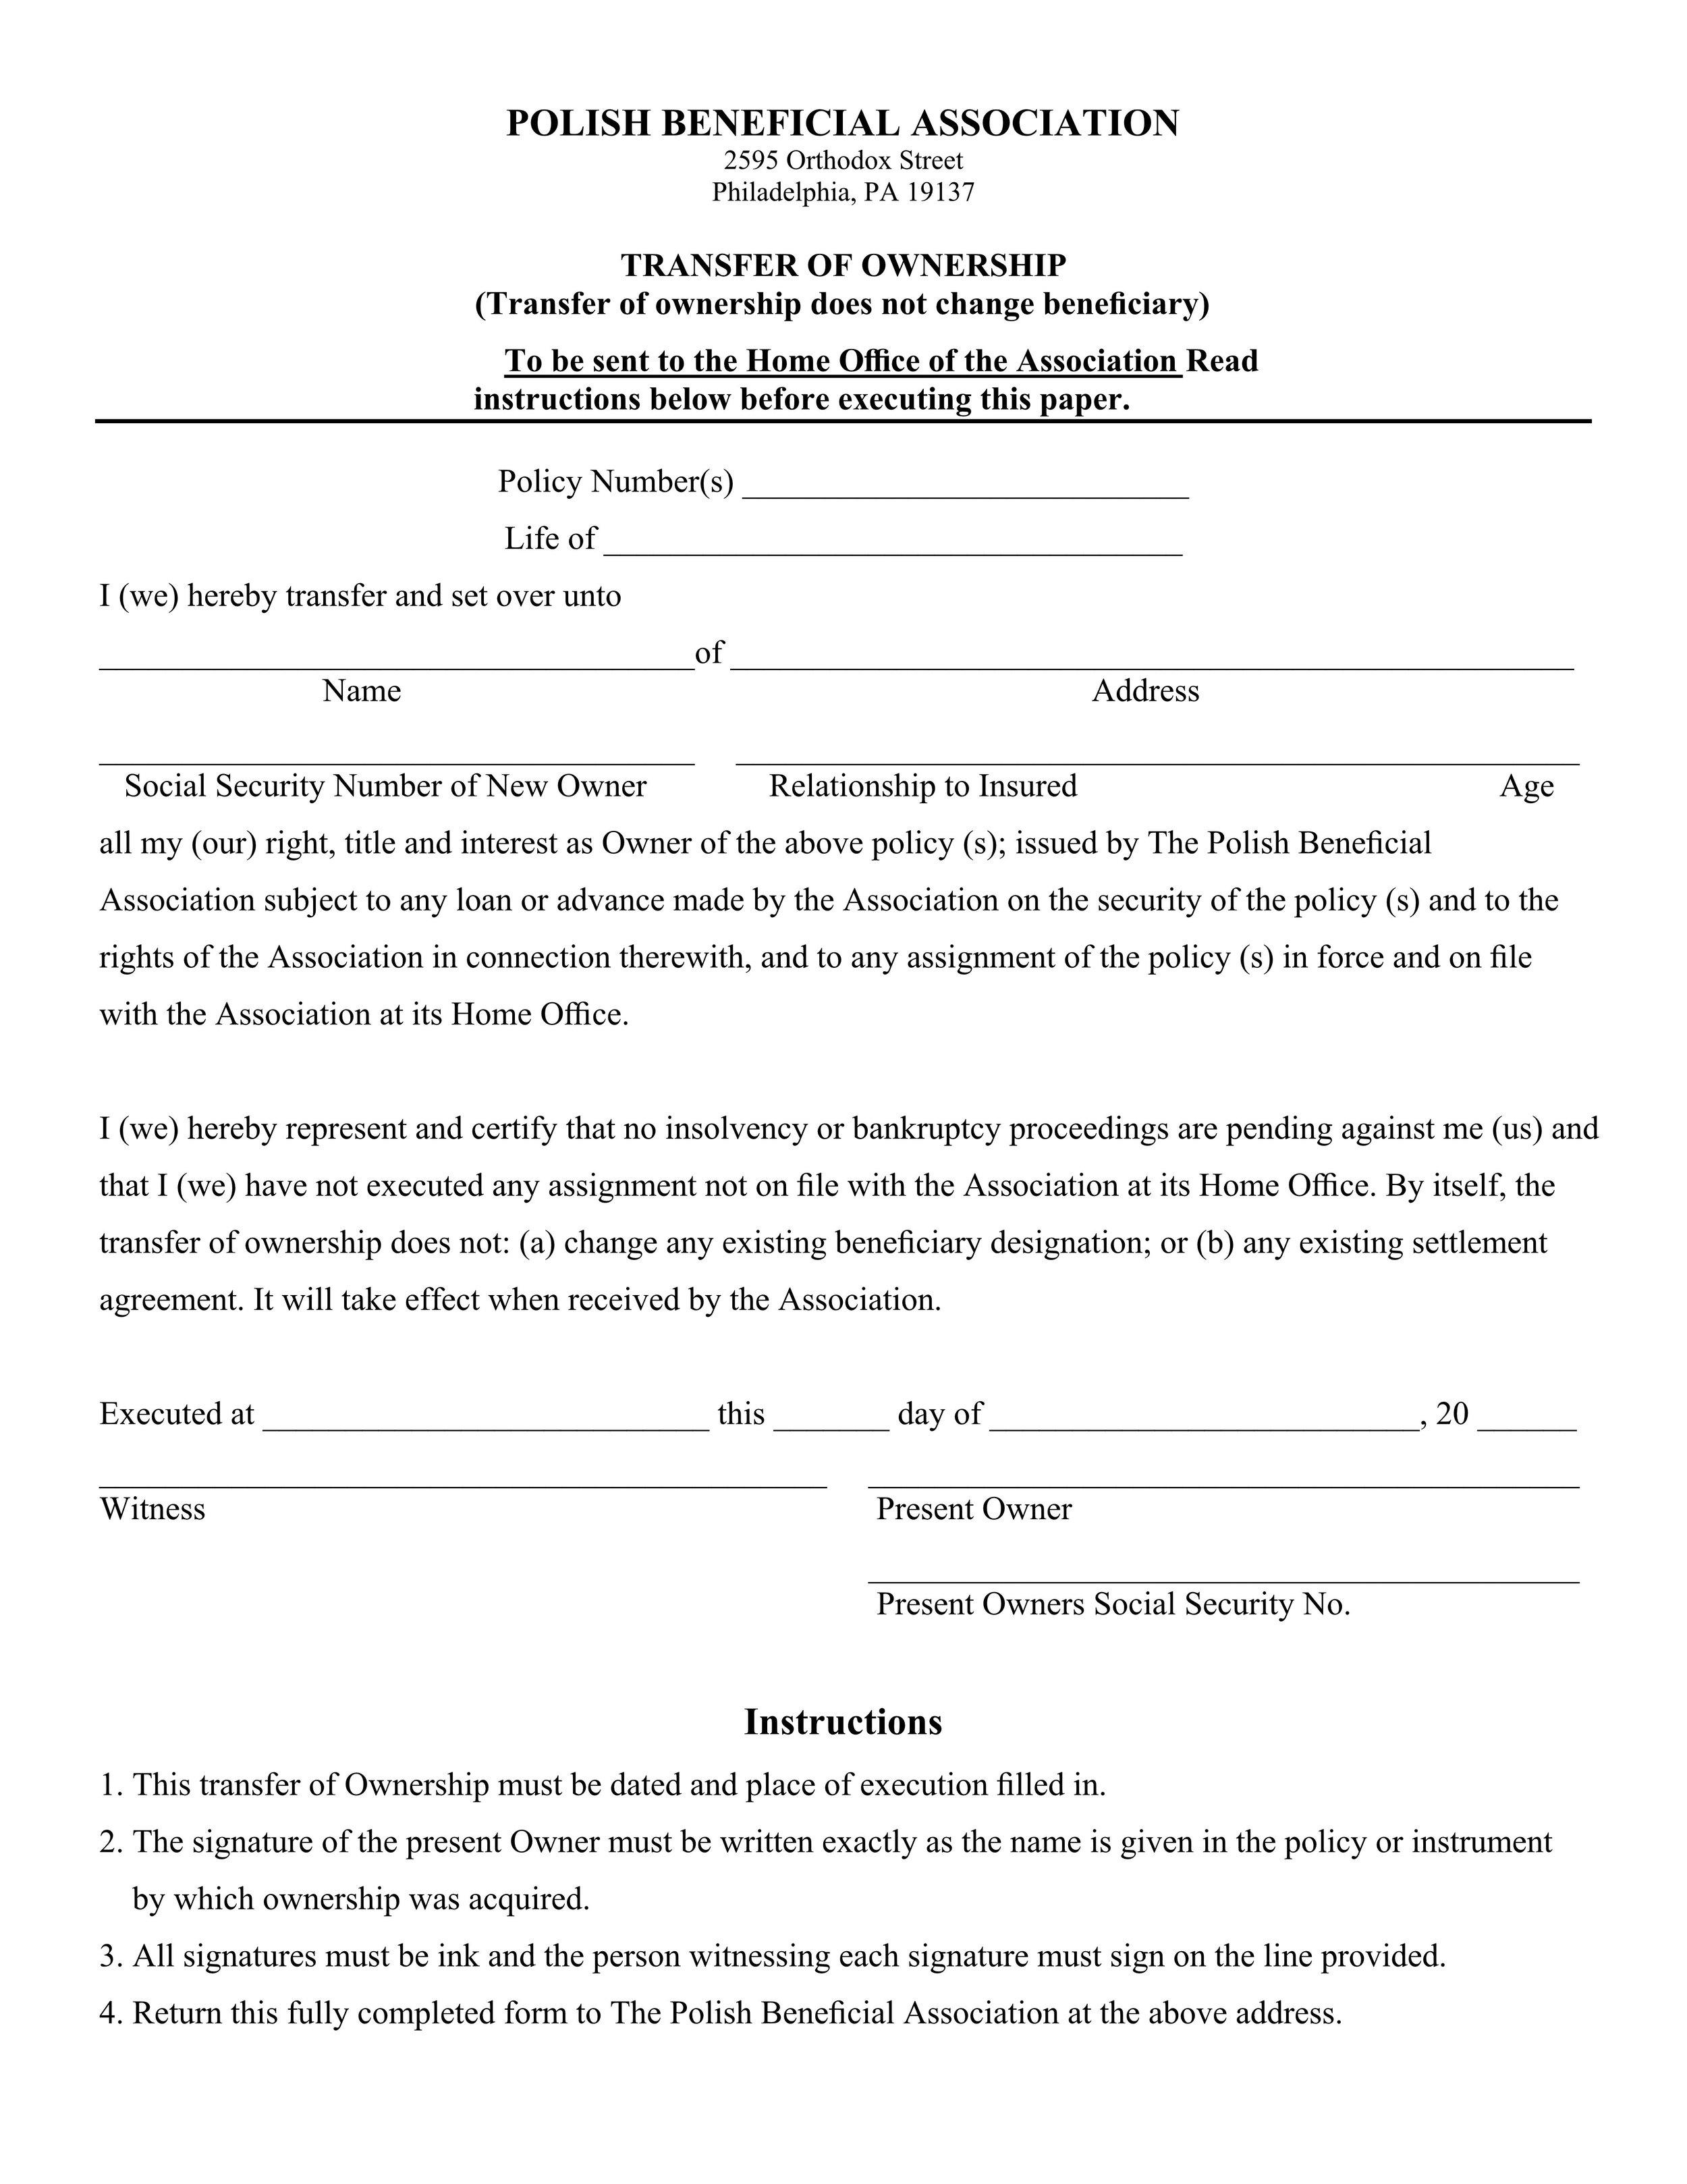 Transfer of Ownership_Image.jpg